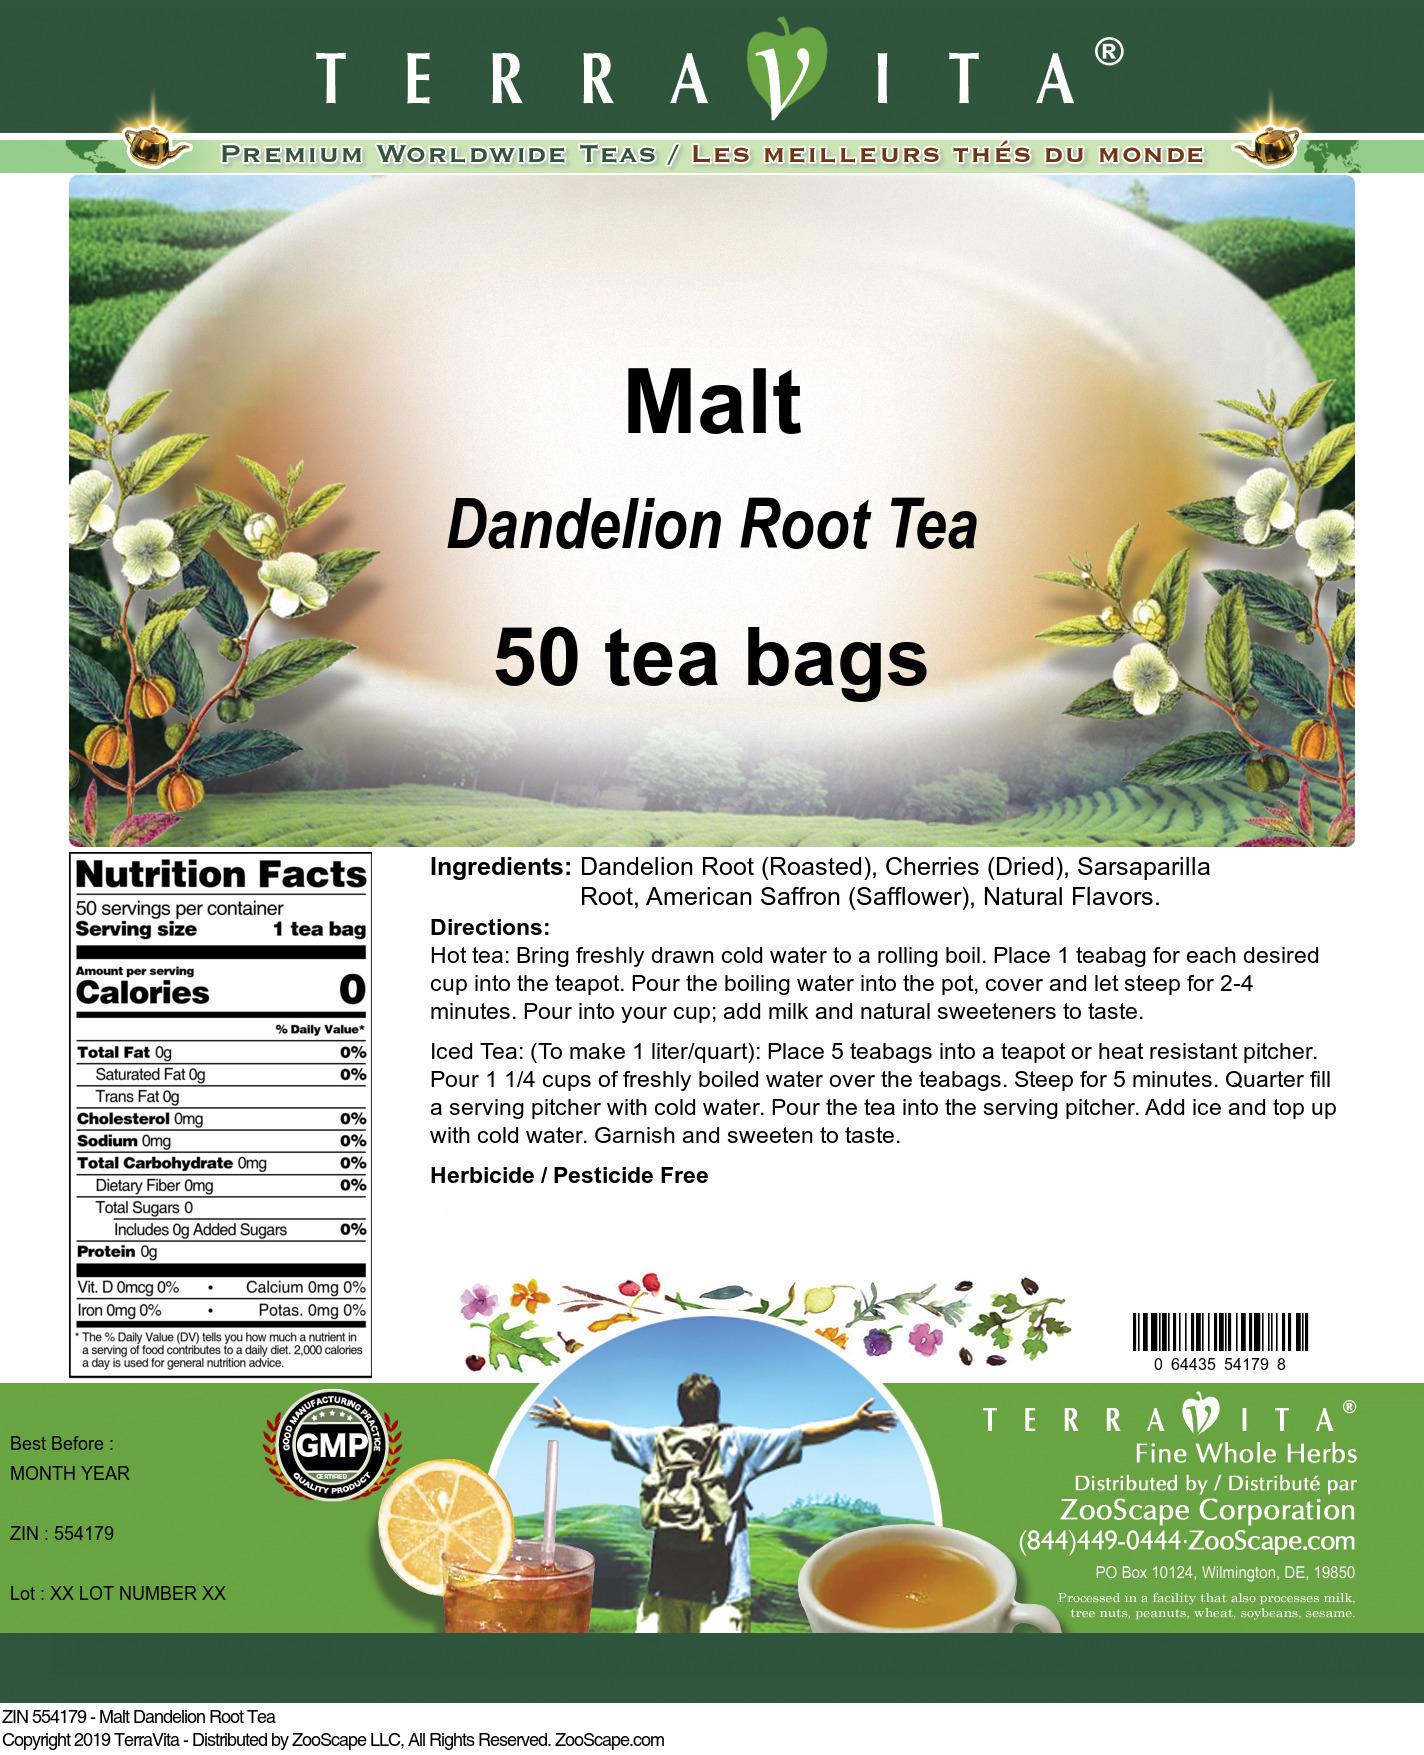 Malt Dandelion Root